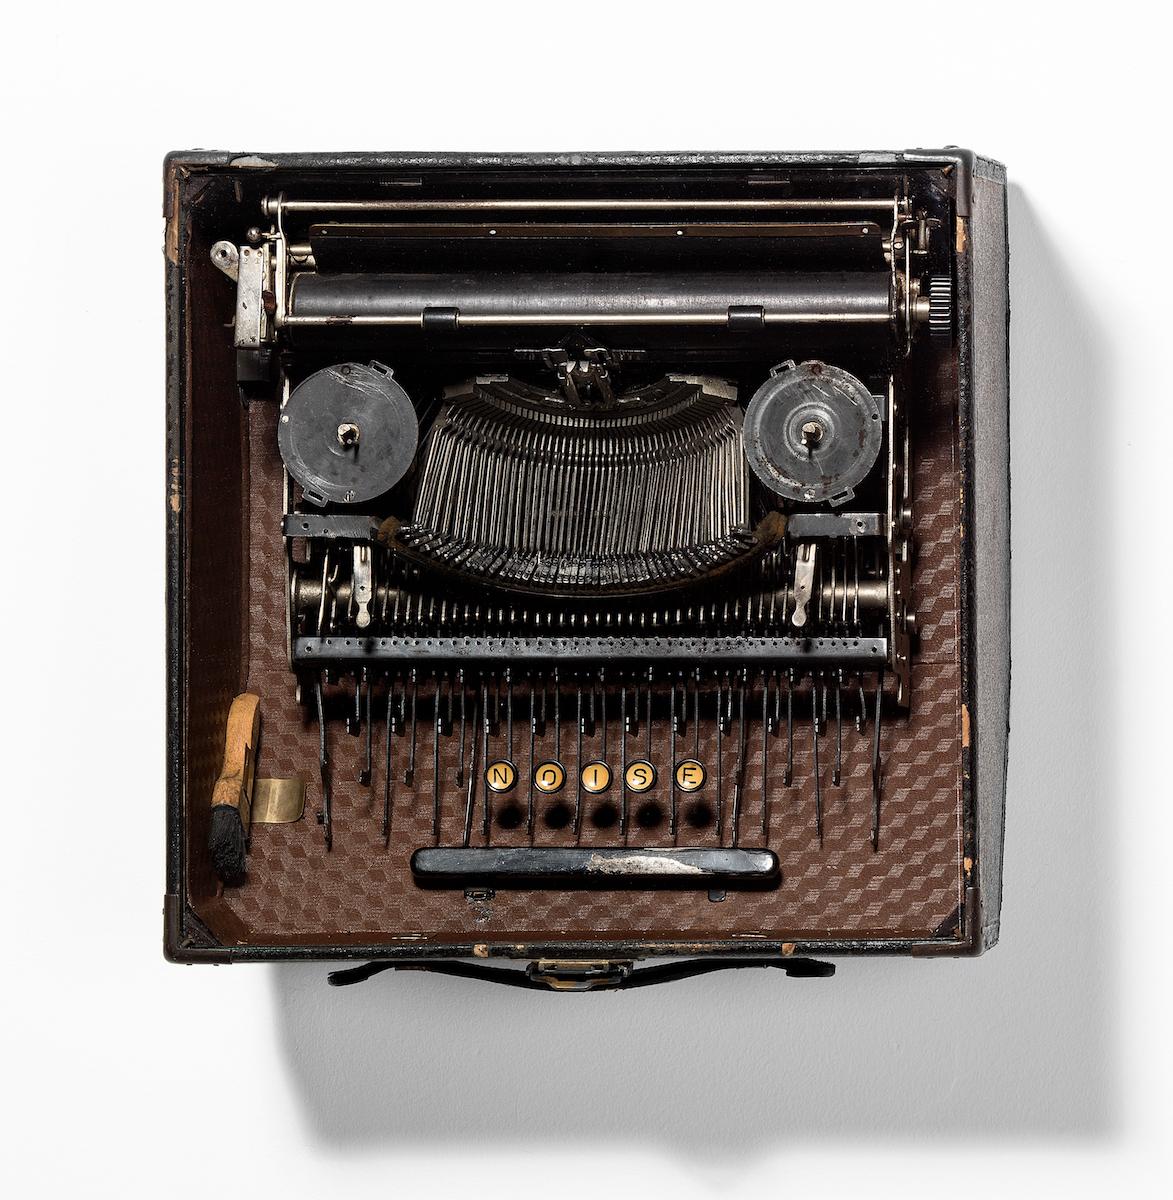 Jacopo Mazzonelli, Noise, 2018, macchina da scrivere vintage, custodia, vetro, cm 35x40x25